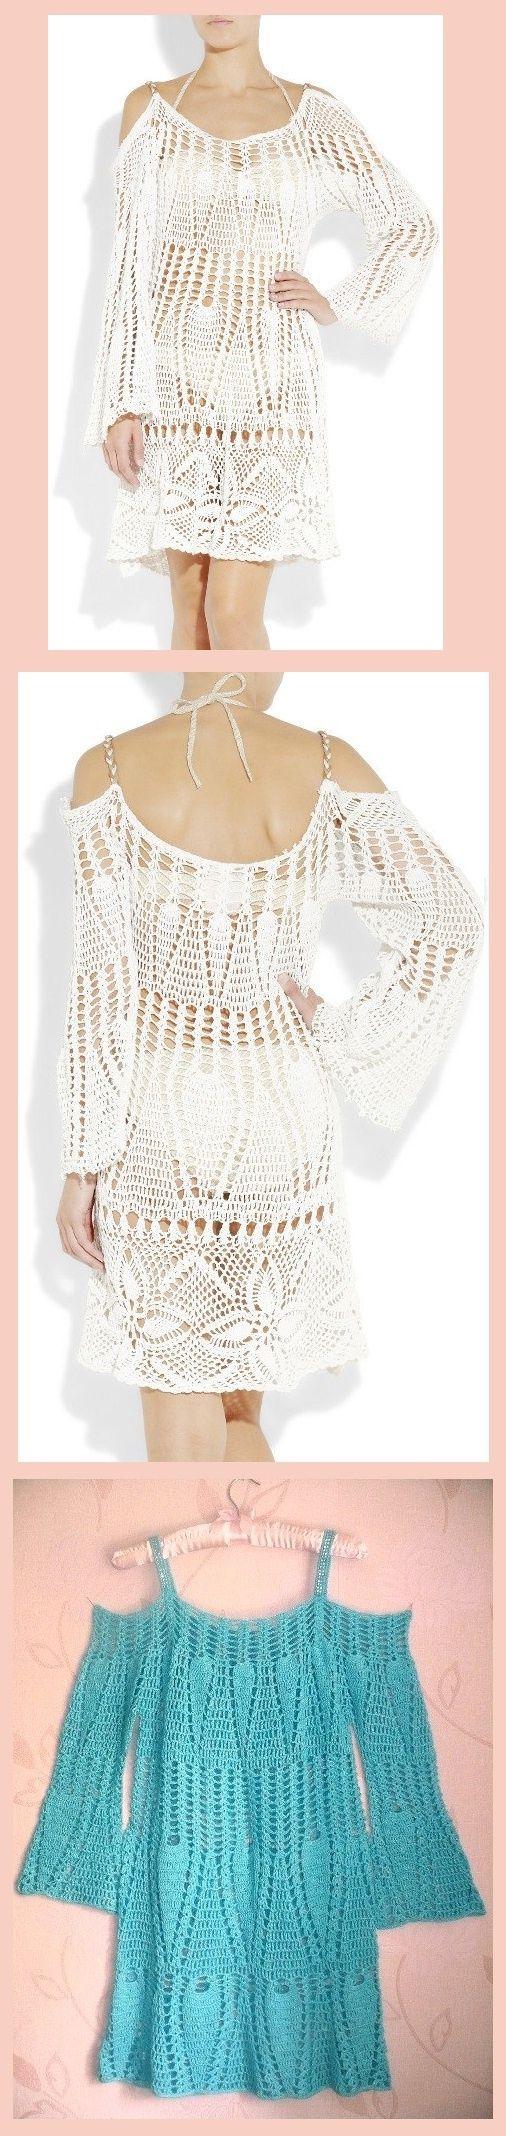 Crochet Tunic....